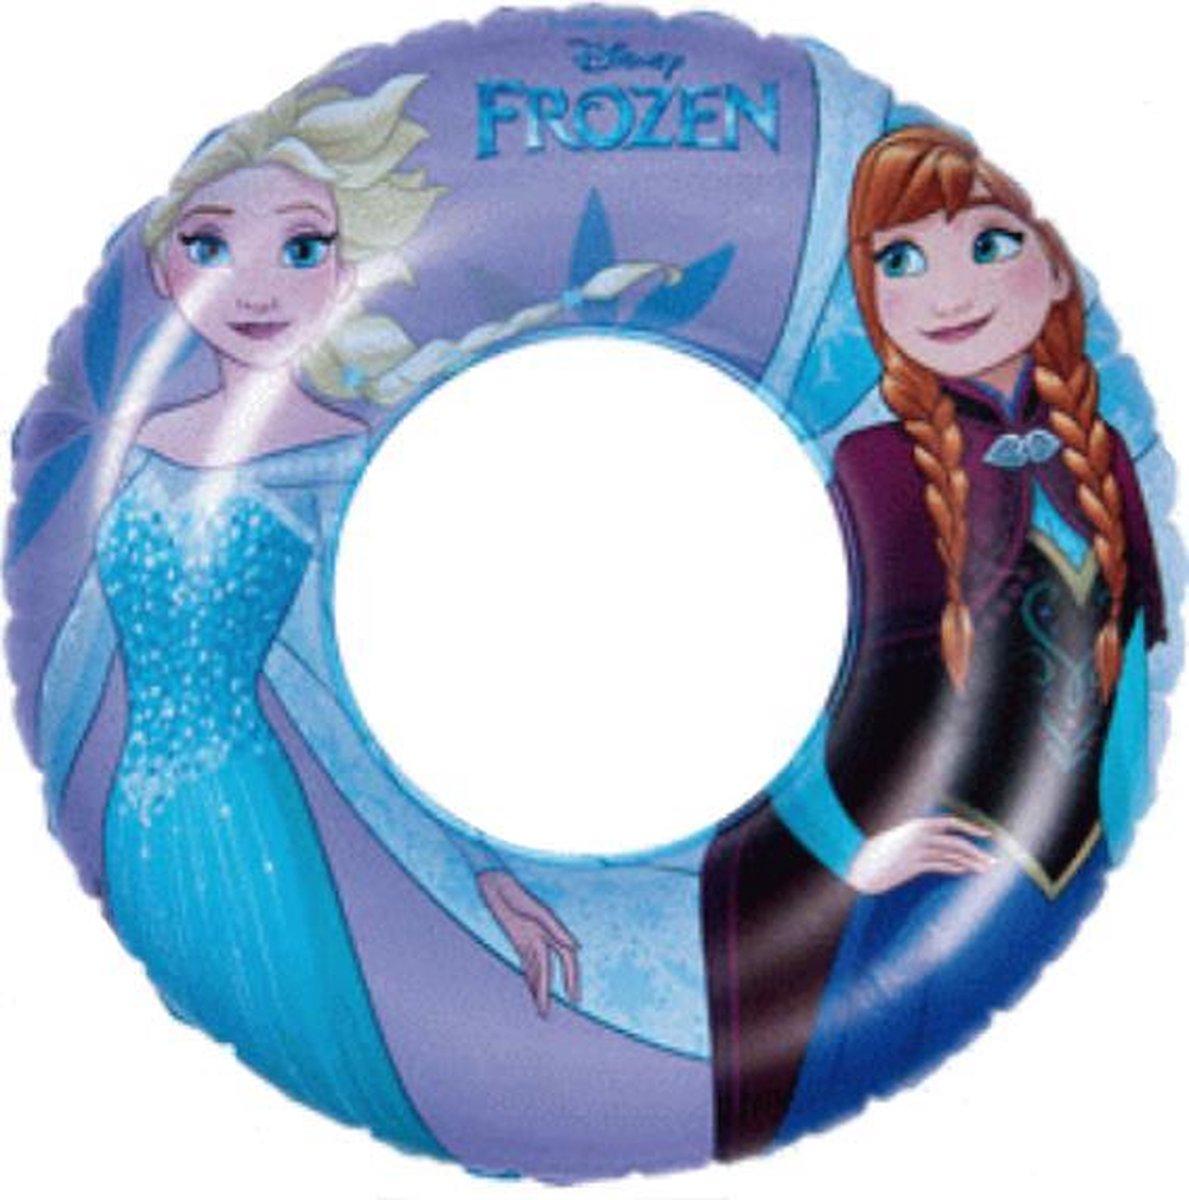 Frozen Zwemband - Ring 51cm - Zwembadspeelgoed - Strand Speelgoed - Anna & Elsa